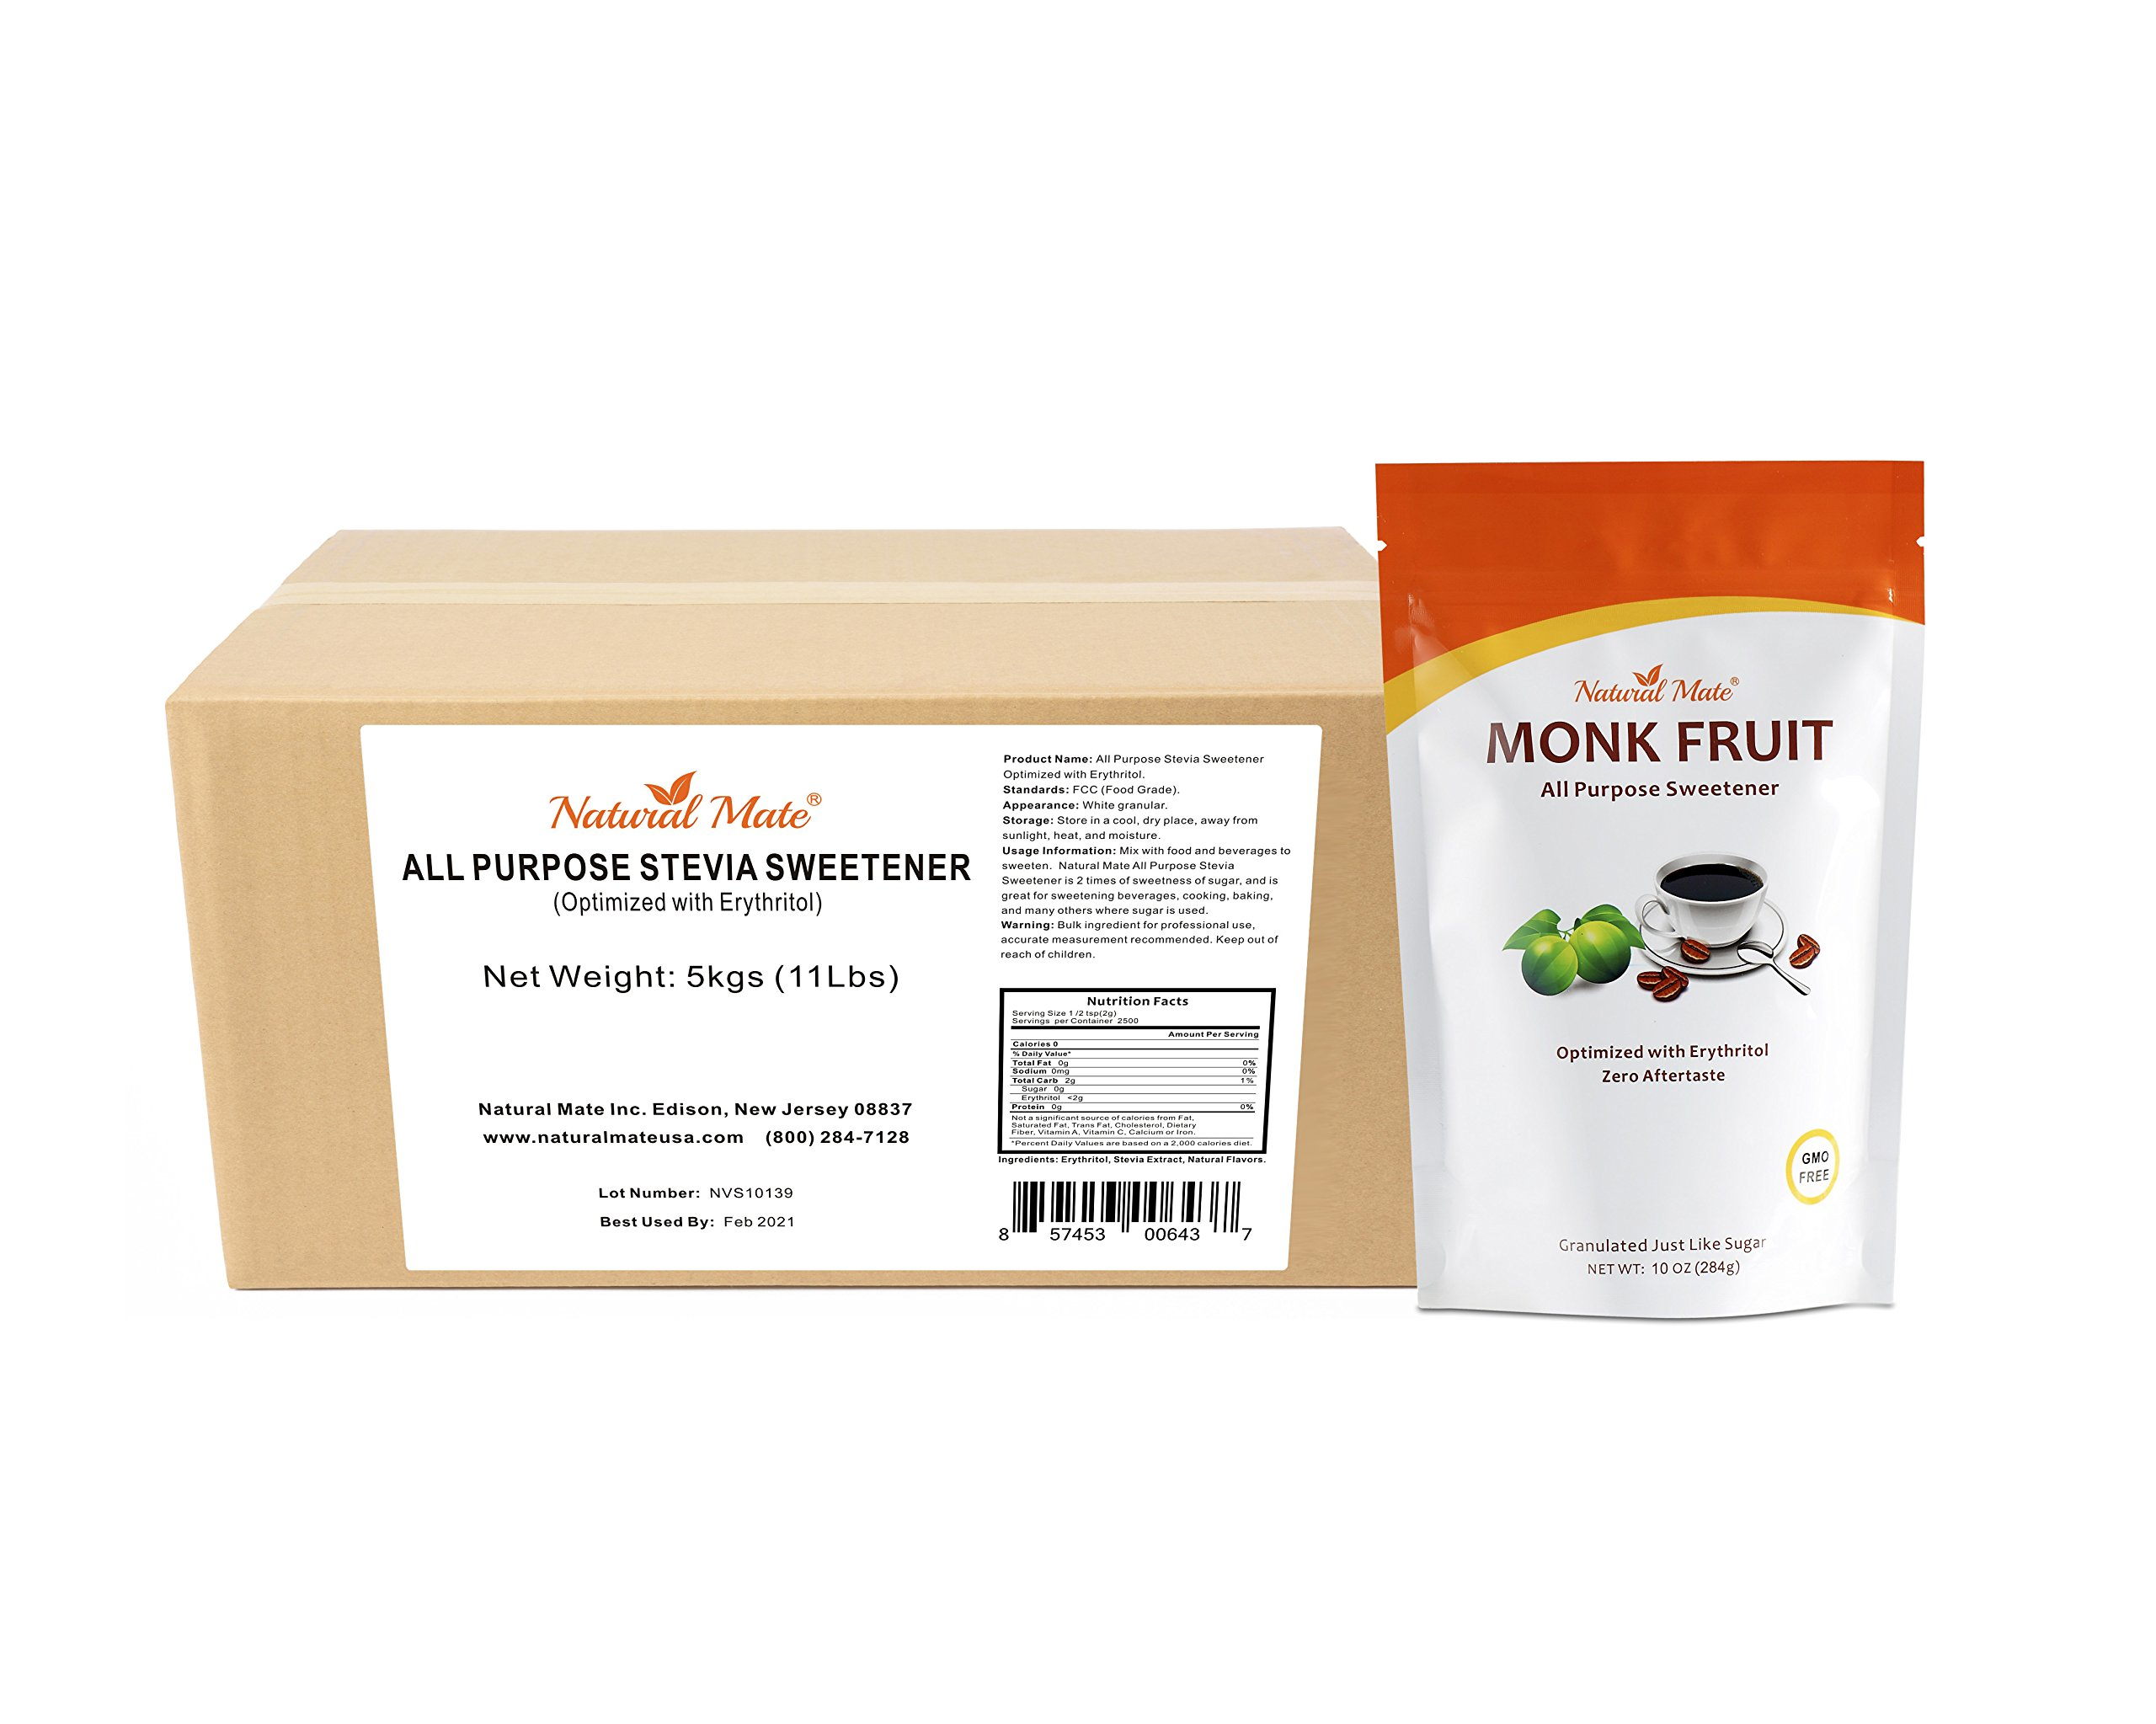 Natural Mate Stevia All Purpose Natural Sweetener, 5kgs/11Lbs   Free Gift: Monk Fruit Sweetener (10oz) by Natural Mate (Image #1)